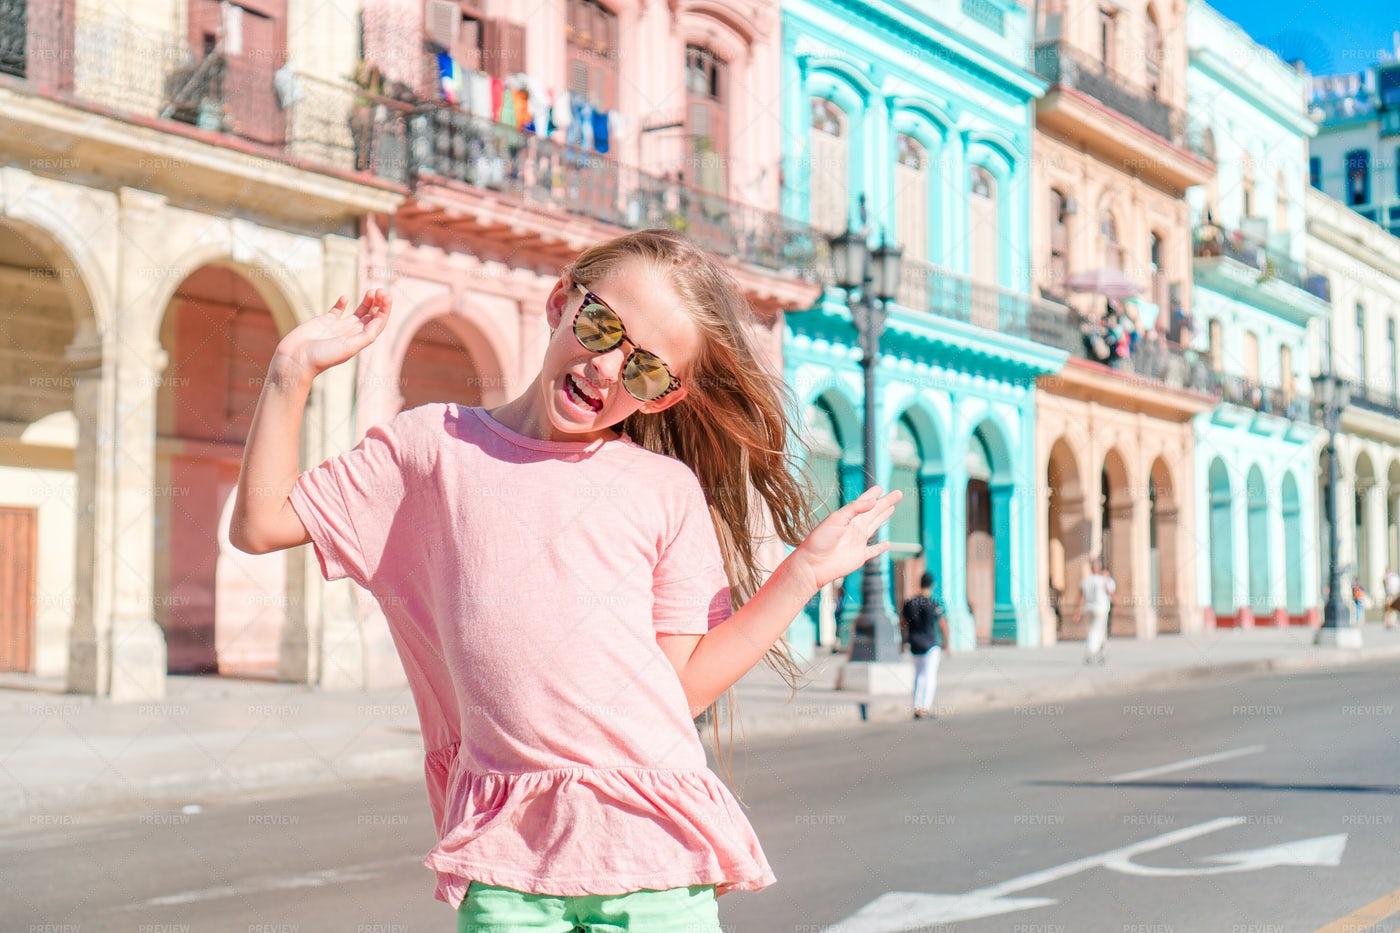 Tourist Girls In Habana, Cuba: Stock Photos